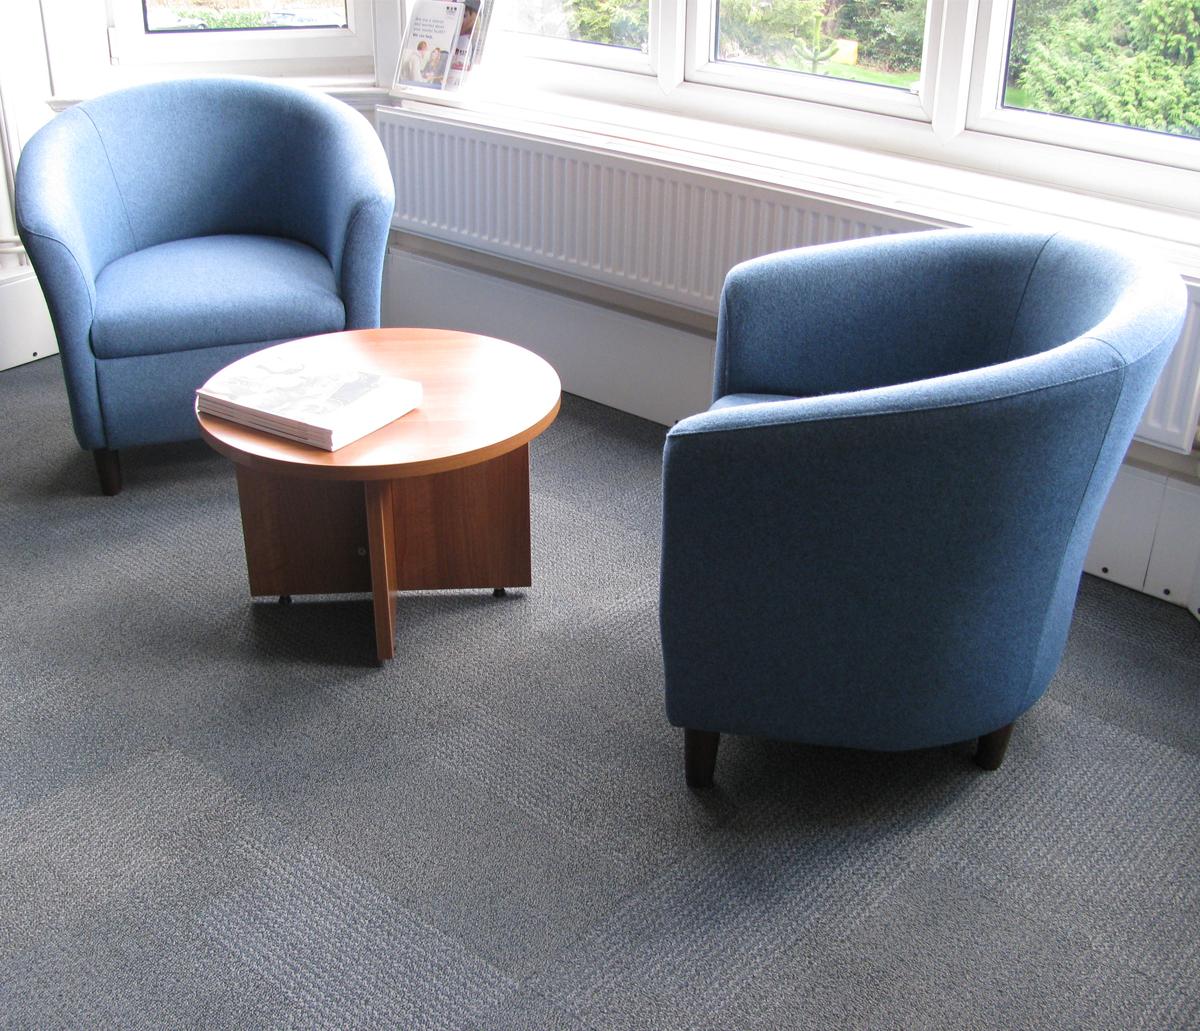 Tub Chairs 100% Virgin Wool